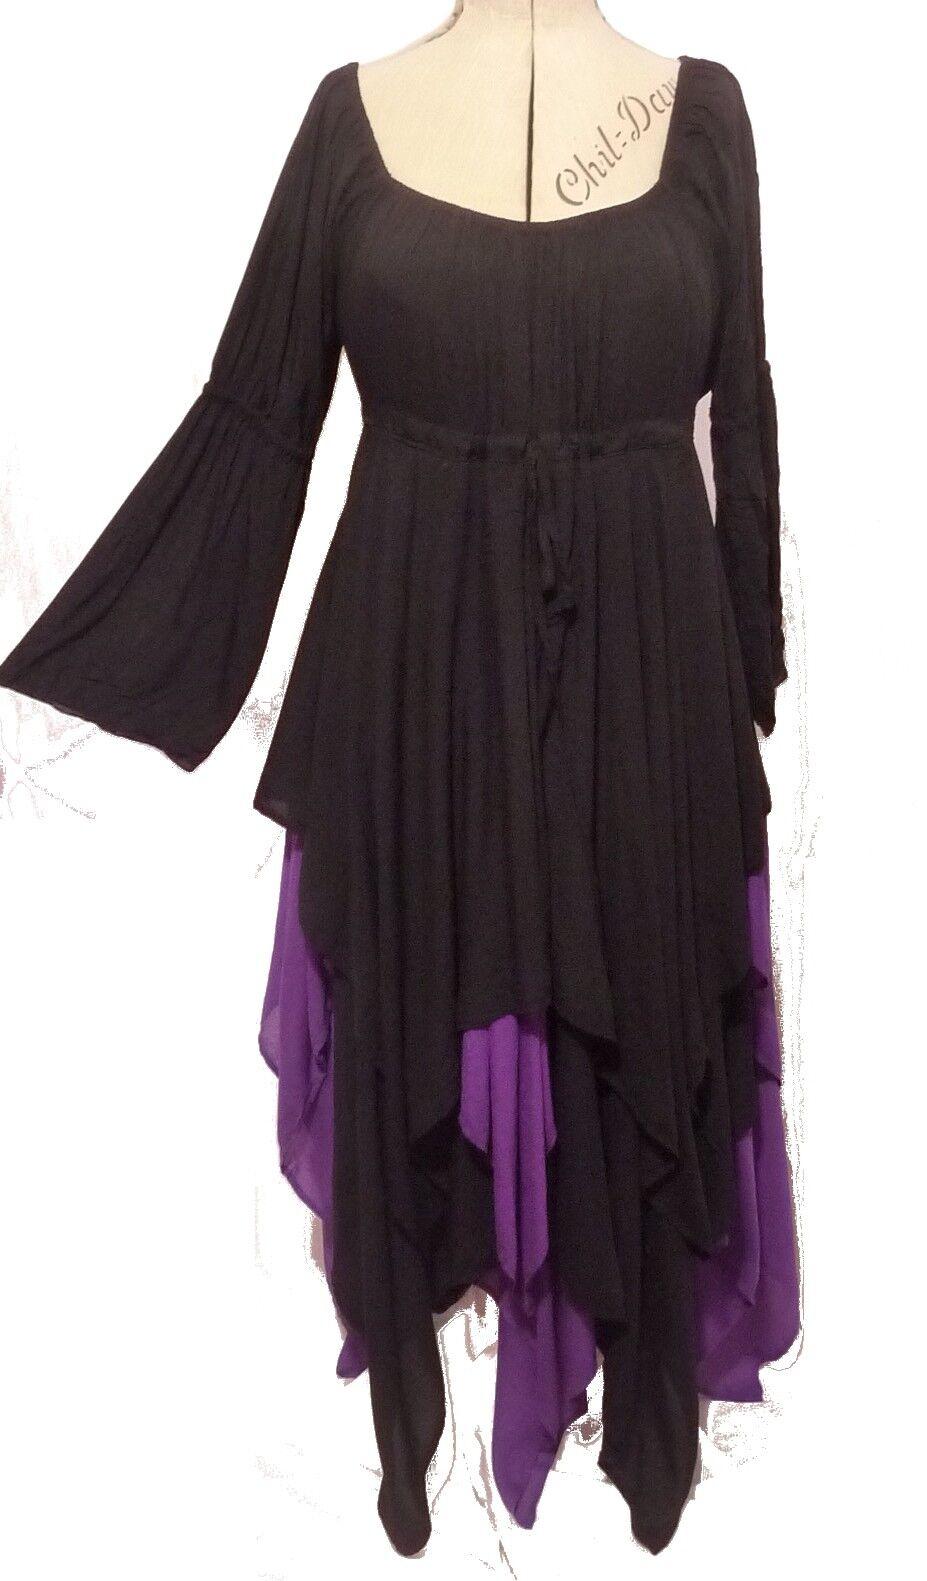 Gothic Fairy schwarz lila peasant dress 12 14 16 18 20 22 24 Swirl Clothing